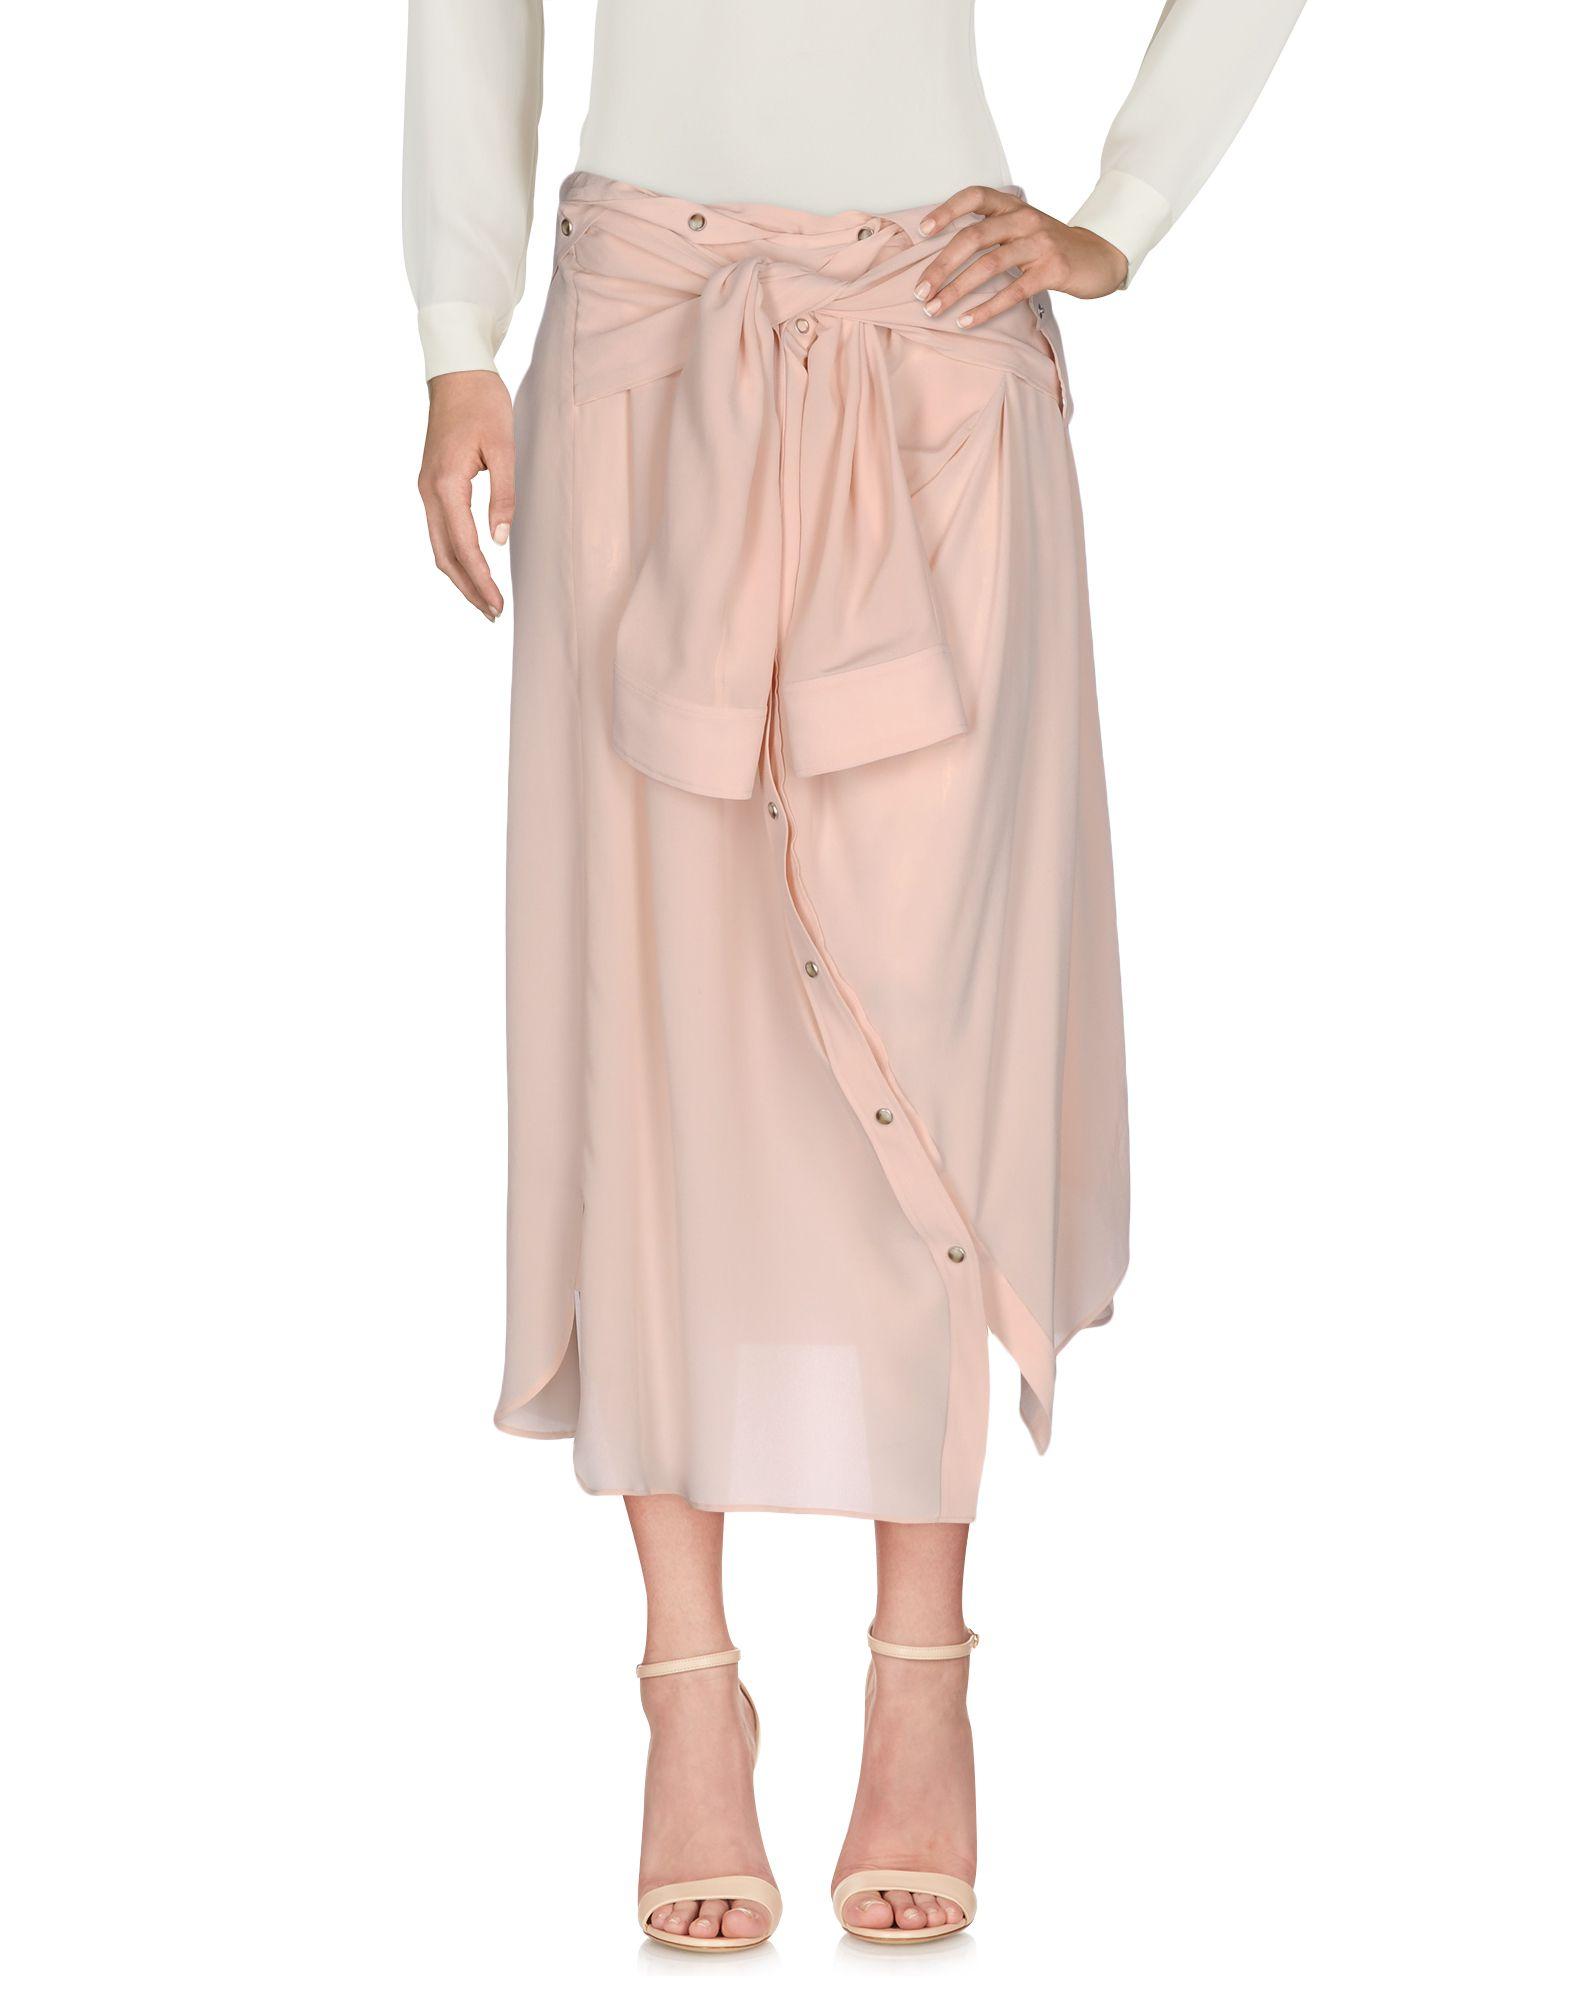 FAITH CONNEXION Юбка длиной 3/4 zimmermann юбка длиной 3 4